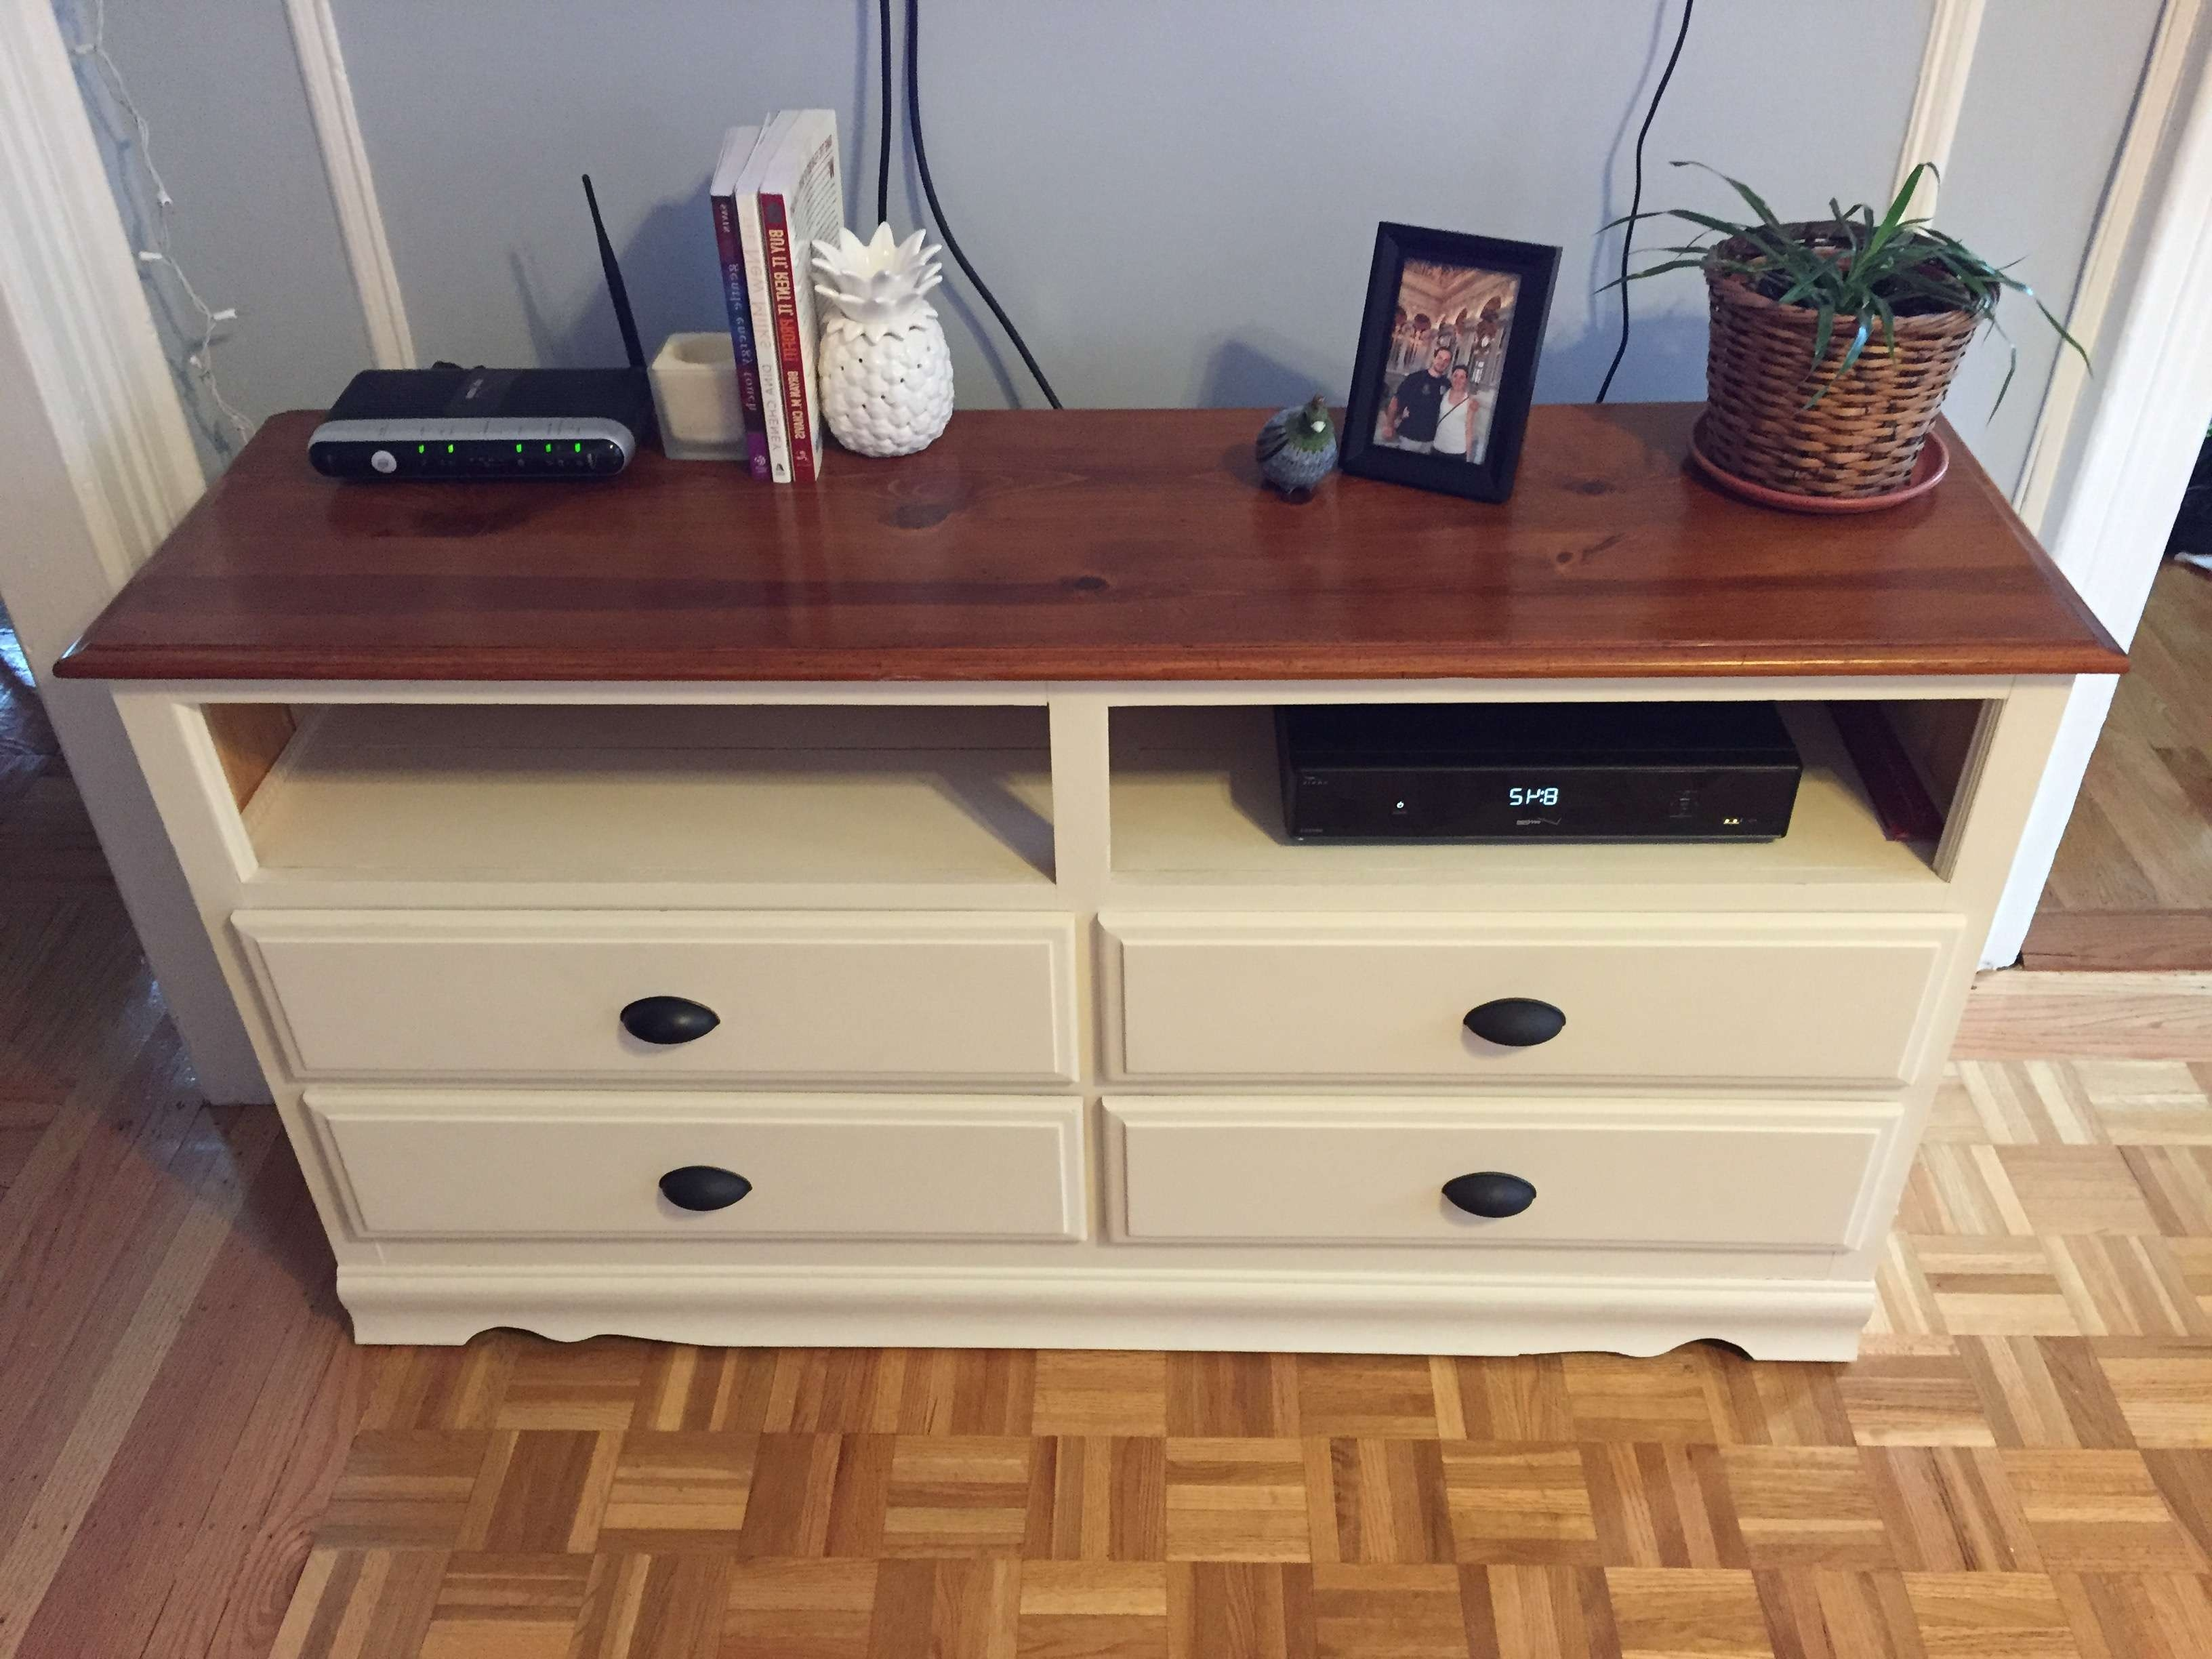 Bedroom Tv Stand Dresser Combo | Johnfante Dressers Inside Dresser And Tv Stands Combination (View 1 of 15)